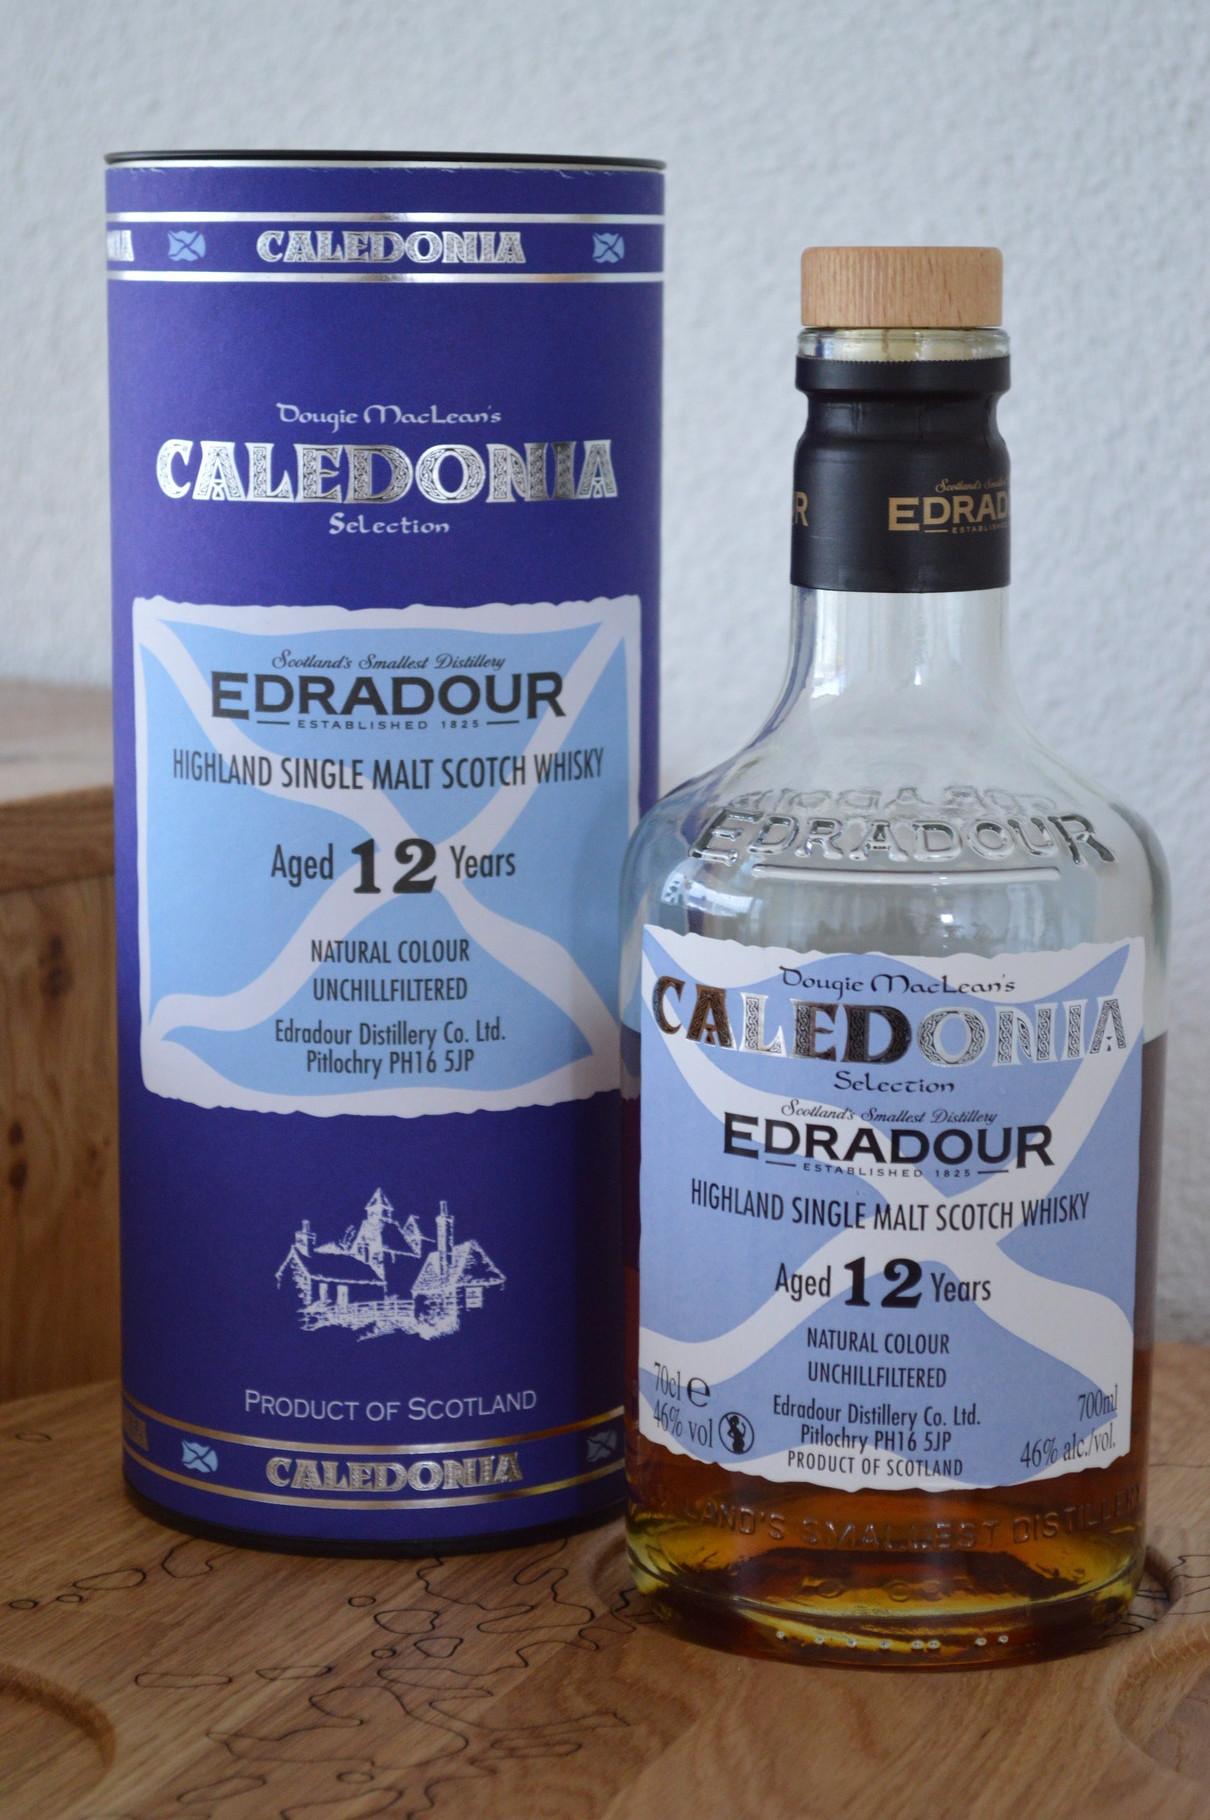 HIGHLANDS - Edradour* - Age: 12 years - Bottler: Original - 70cl - 46% - Caledonia